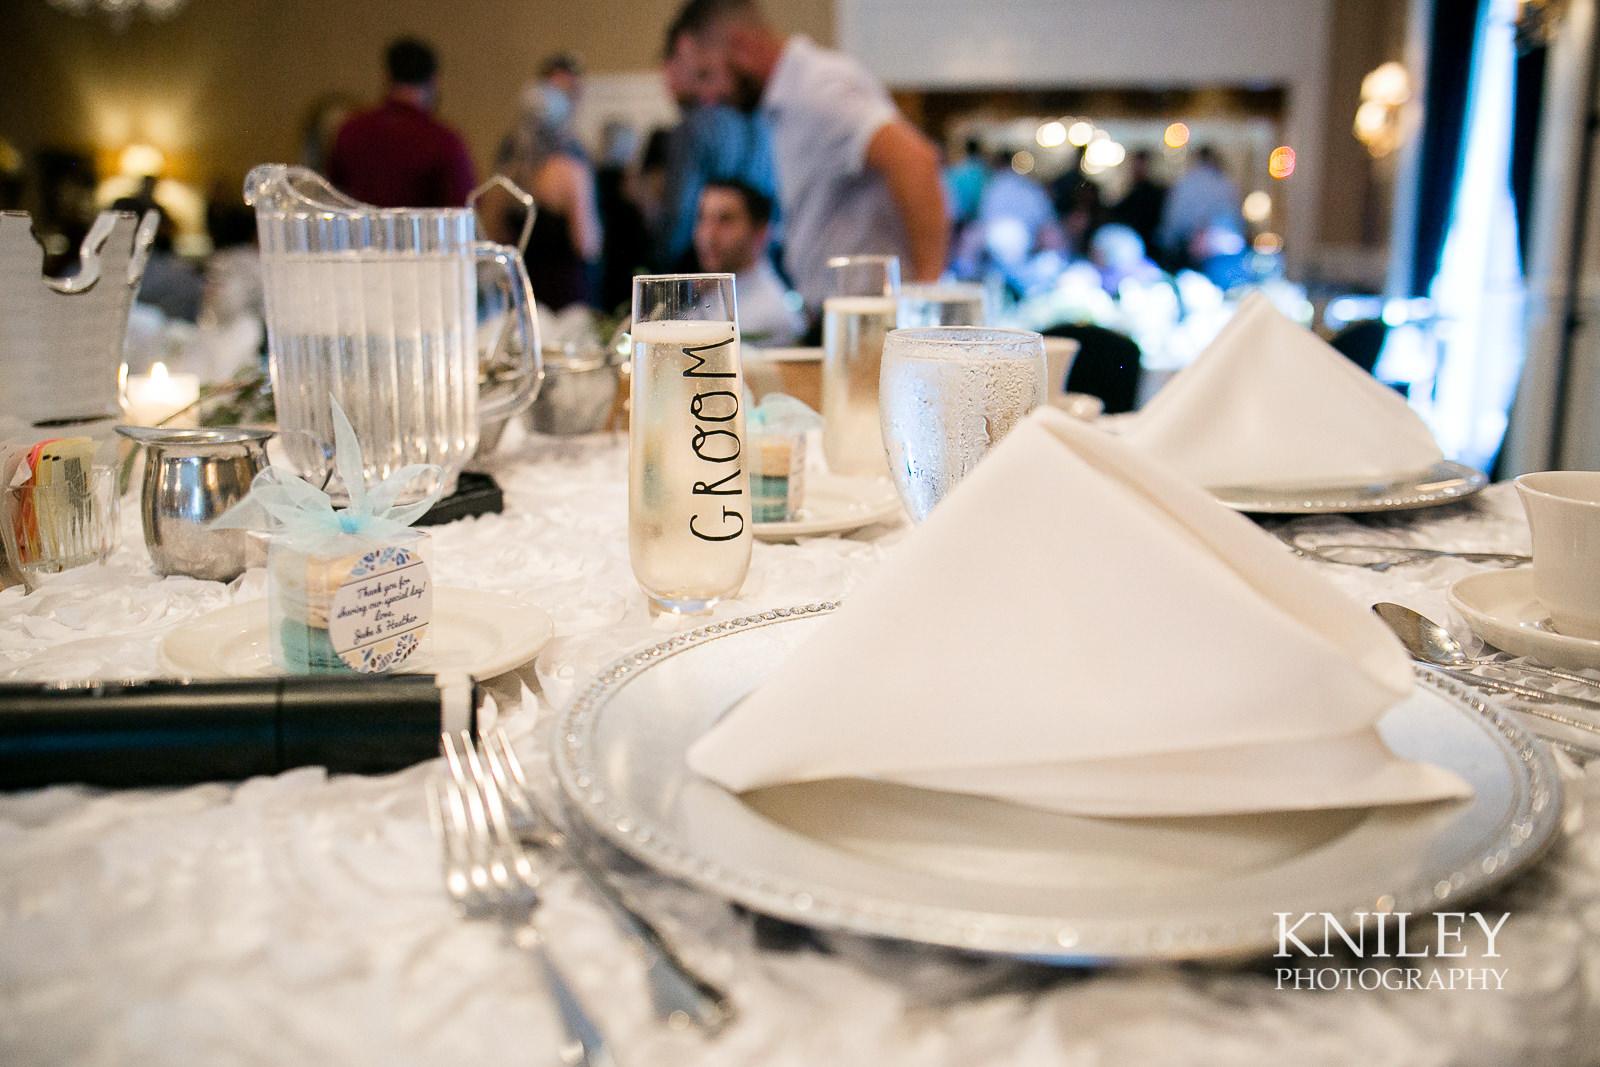 083 - Buffalo NY wedding pictures - Sean Patrick Restaurant Wedding Reception - Getzville - IMG_8384.jpg